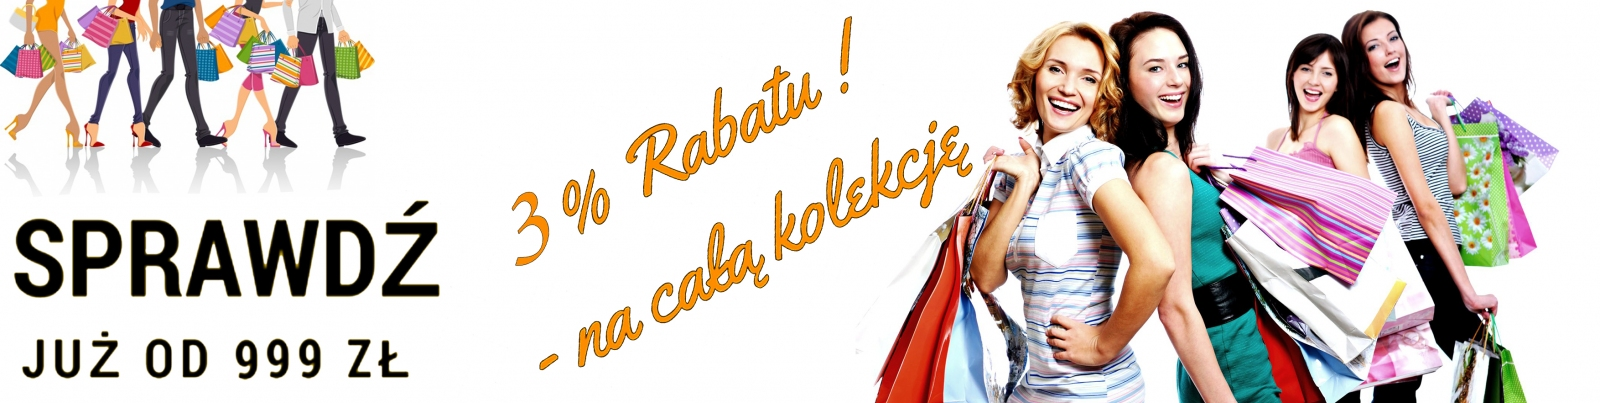 Rabat 3 %